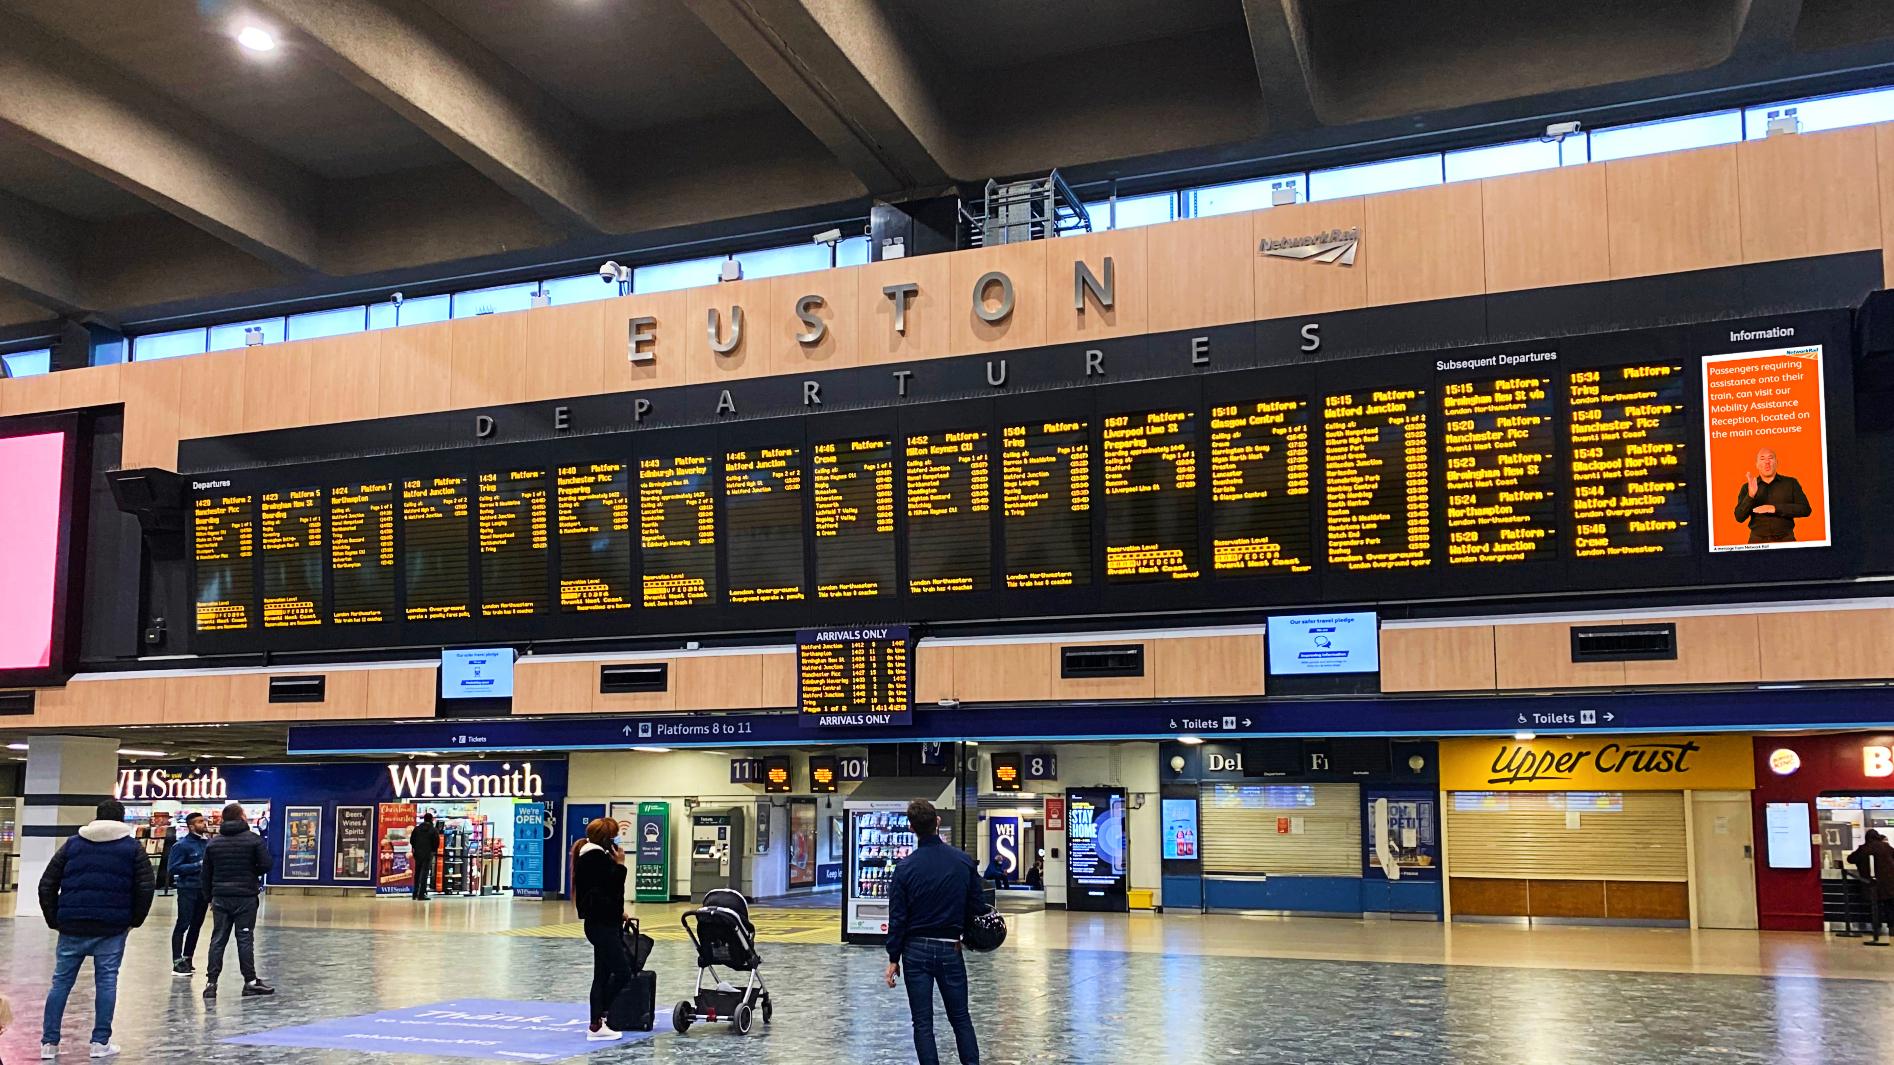 British Sign Language screens launched at Euston Station